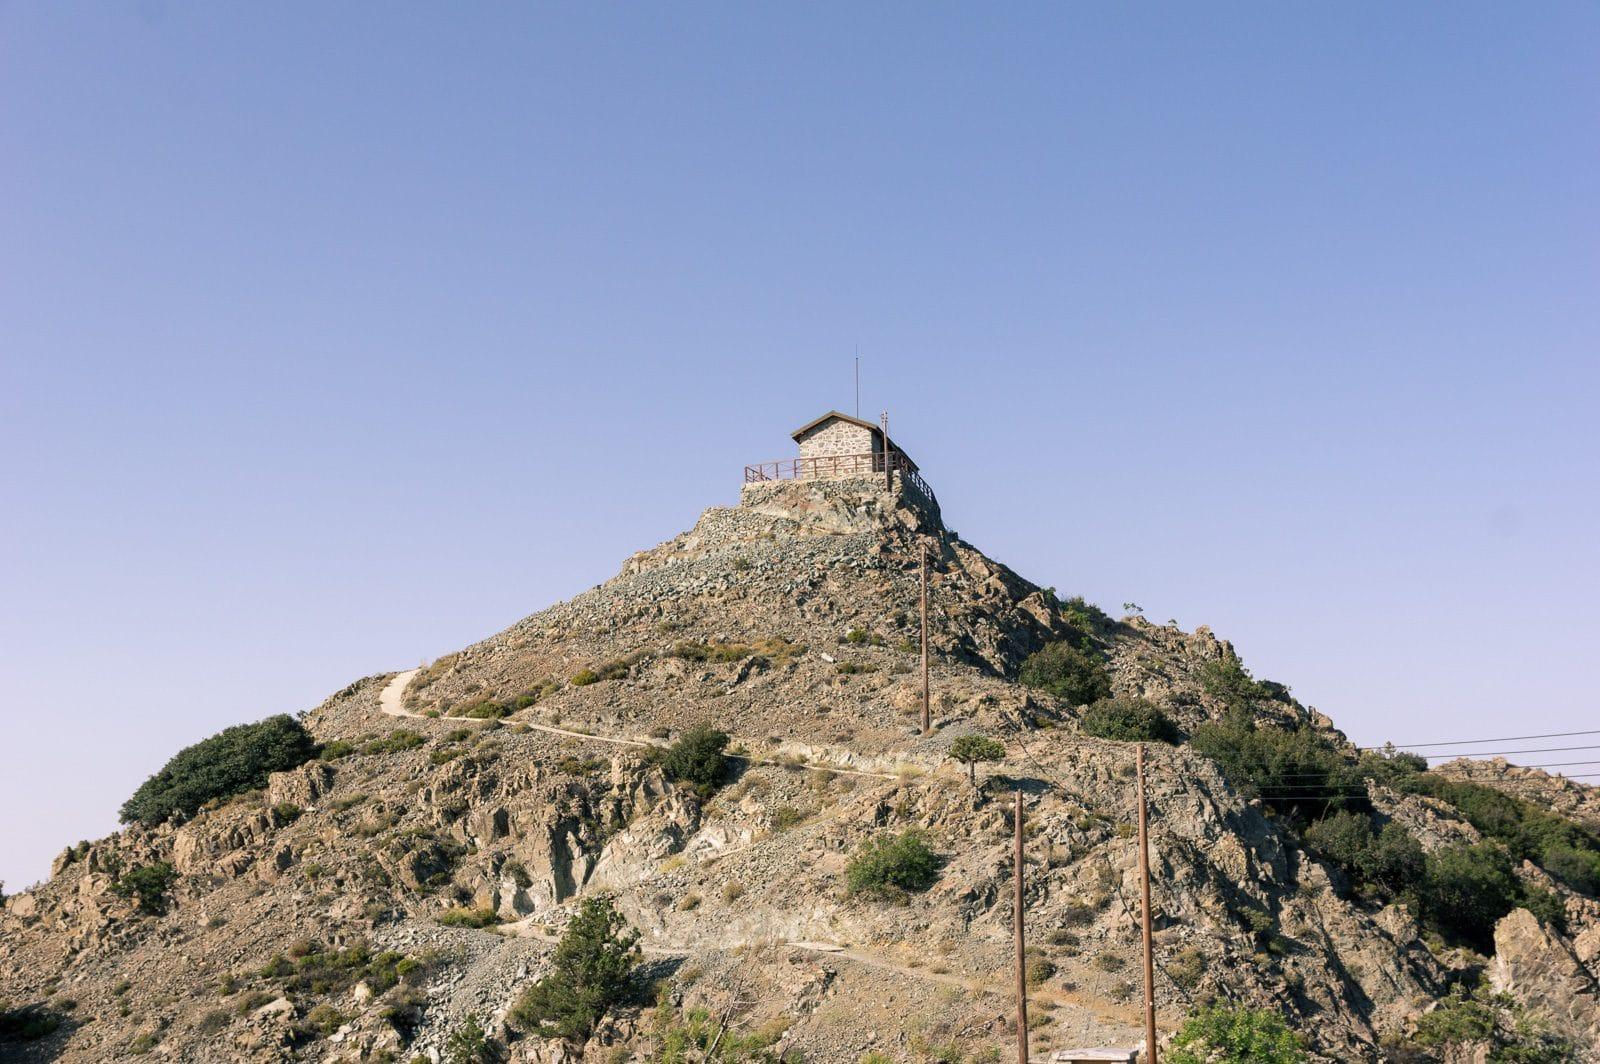 the fire lookout of Madari on top of Aderfi peak